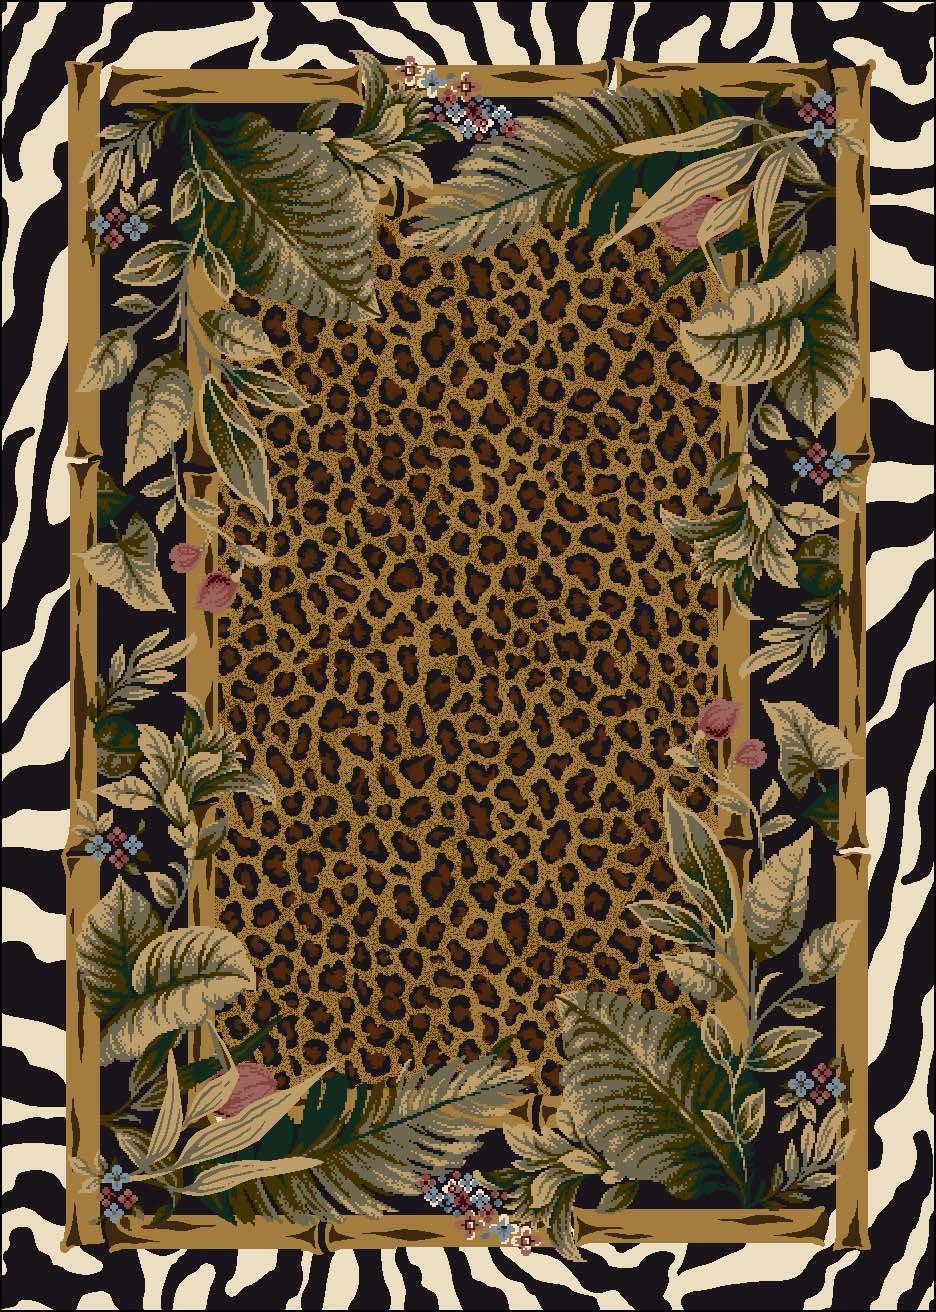 Milliken Signature Jungle Safari Skins Rug 2'8'' x 3'10''